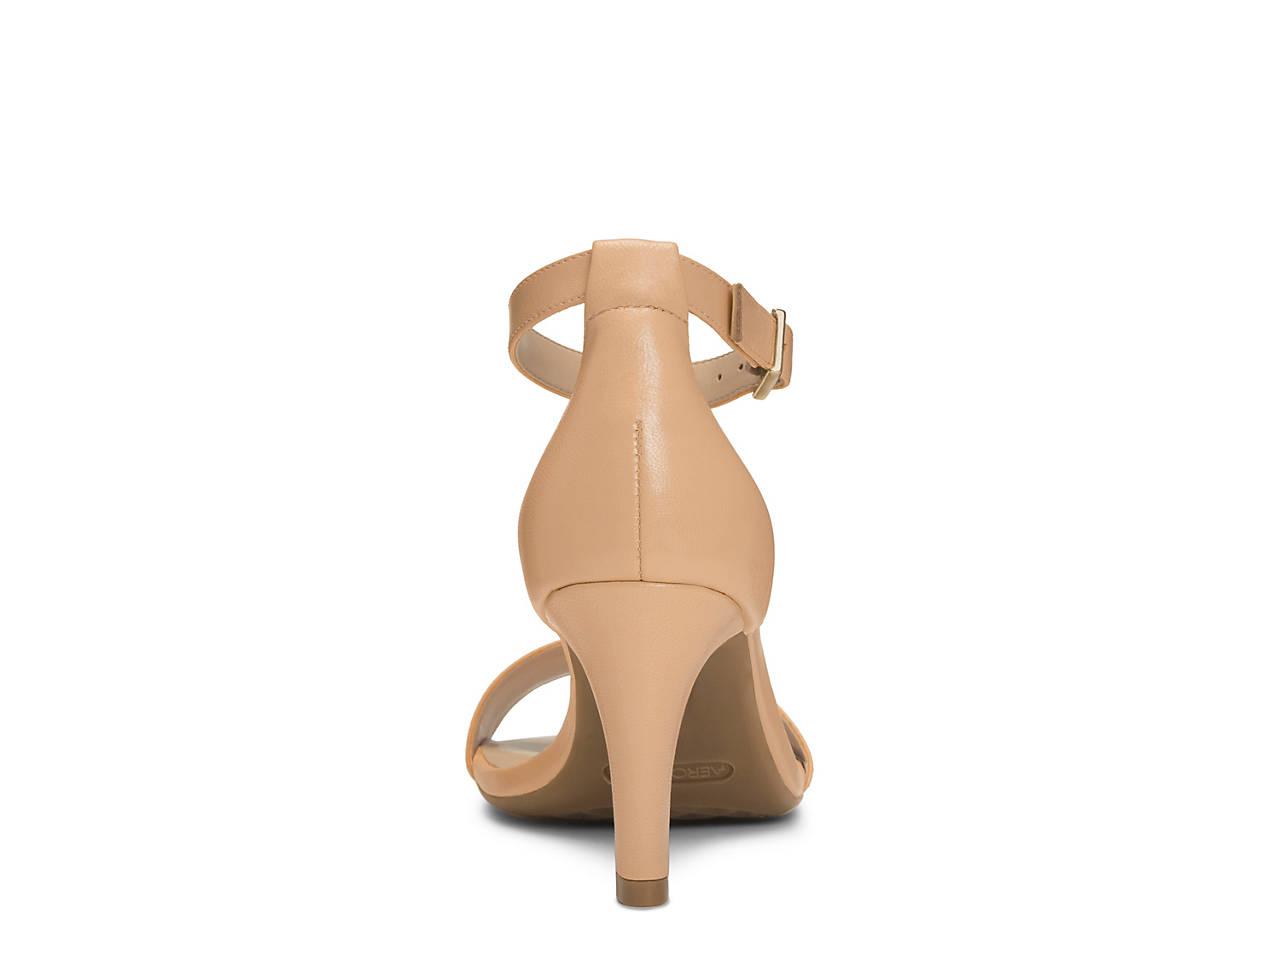 82003cb22bd5 Aerosoles Laminate Sandal Women s Shoes